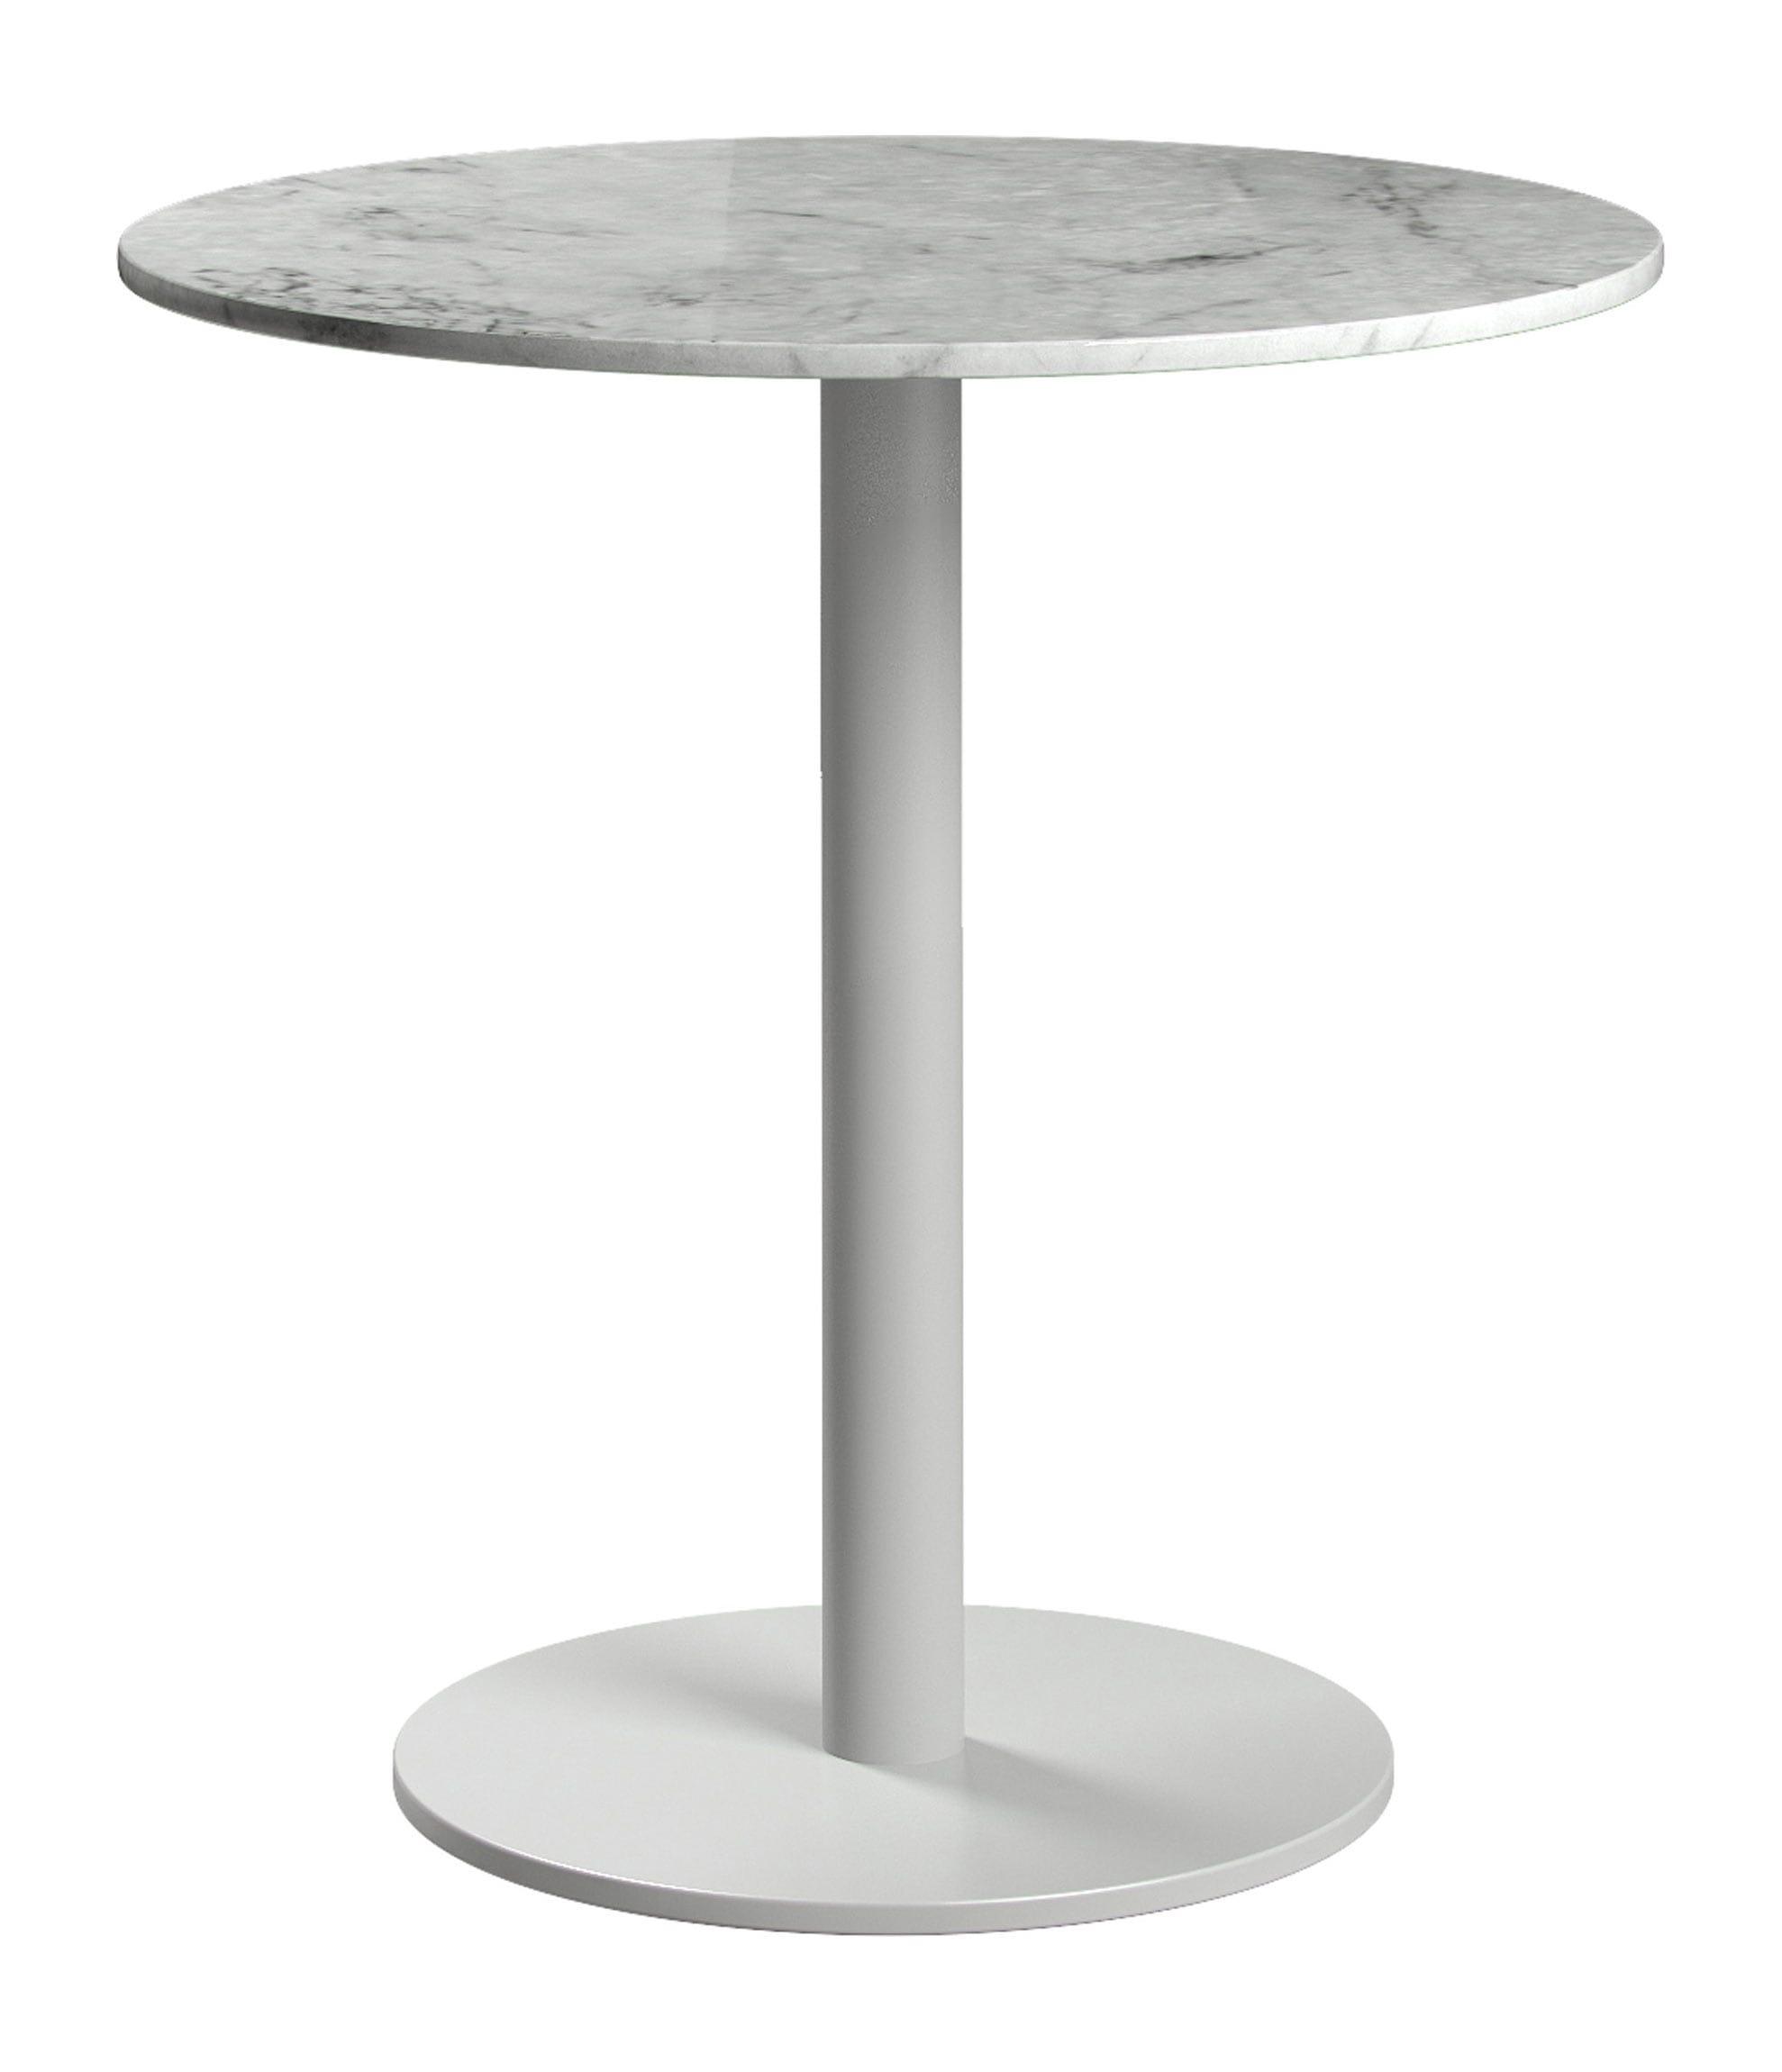 bleecker side table white marble by modloft. Black Bedroom Furniture Sets. Home Design Ideas